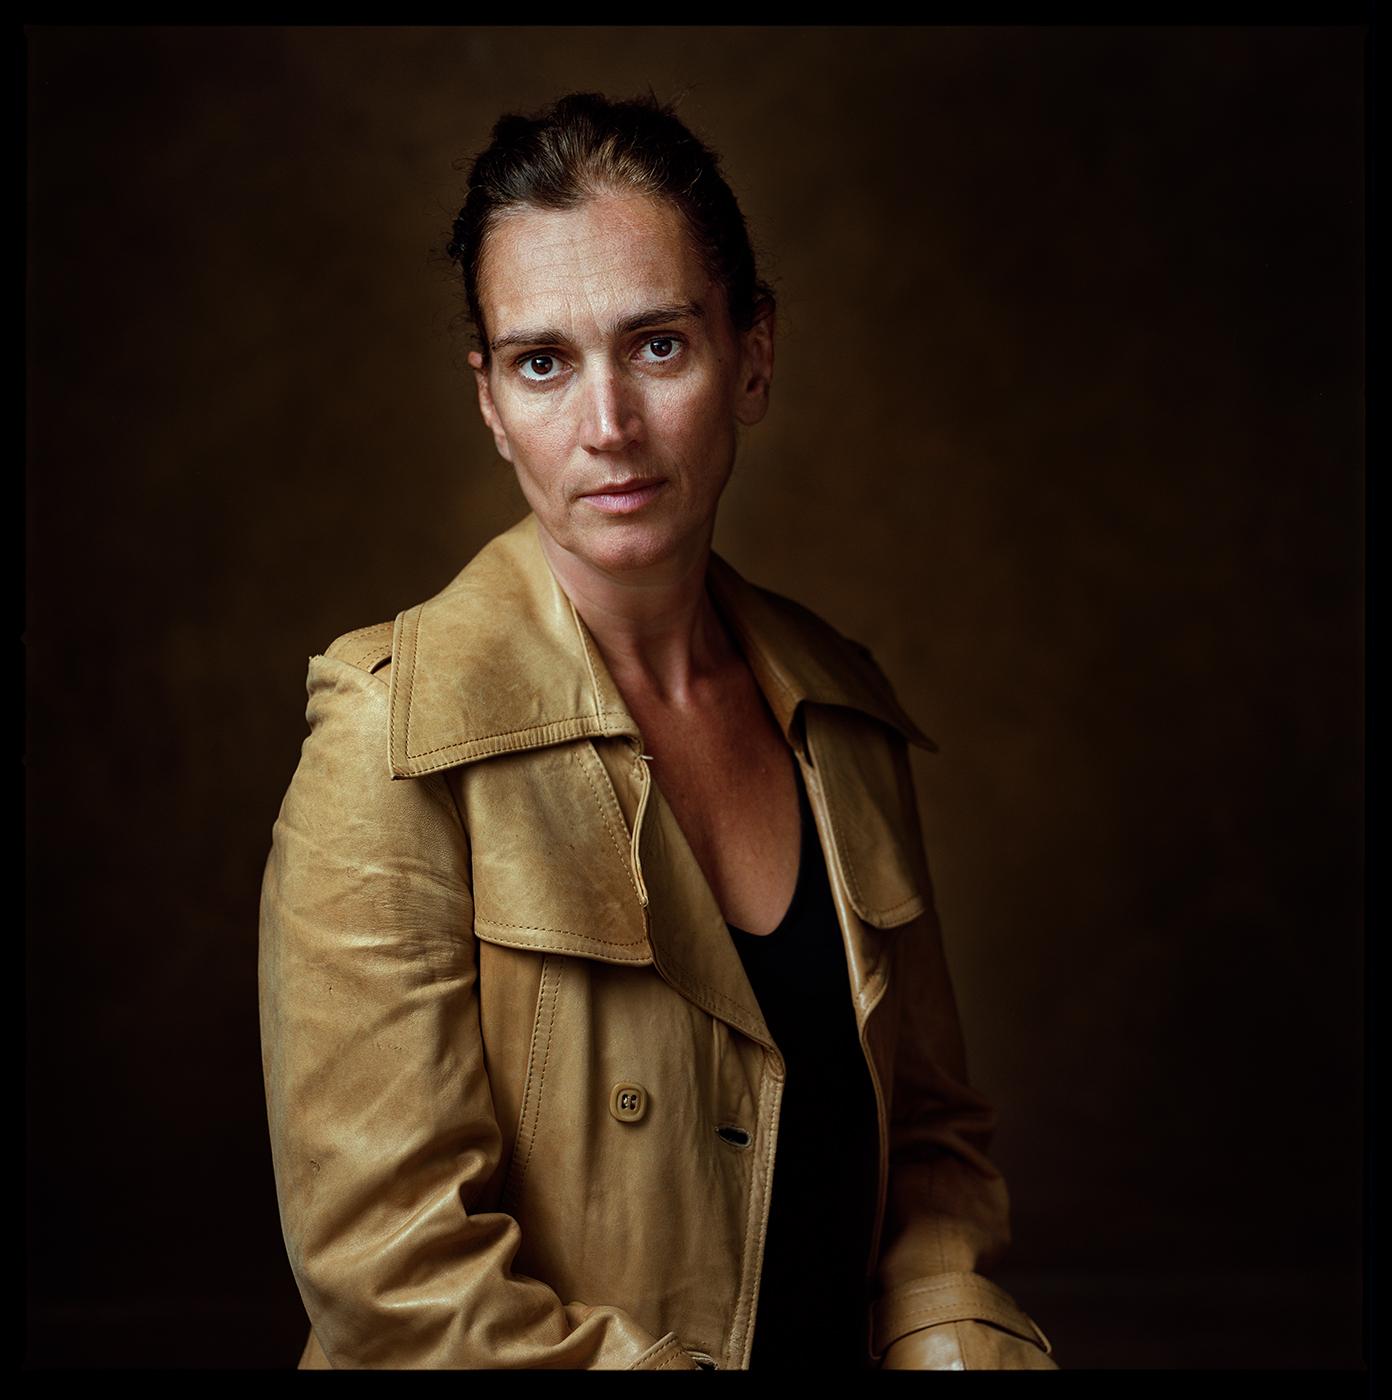 Susanne Middelberg, portrait, Monic Hendrickx